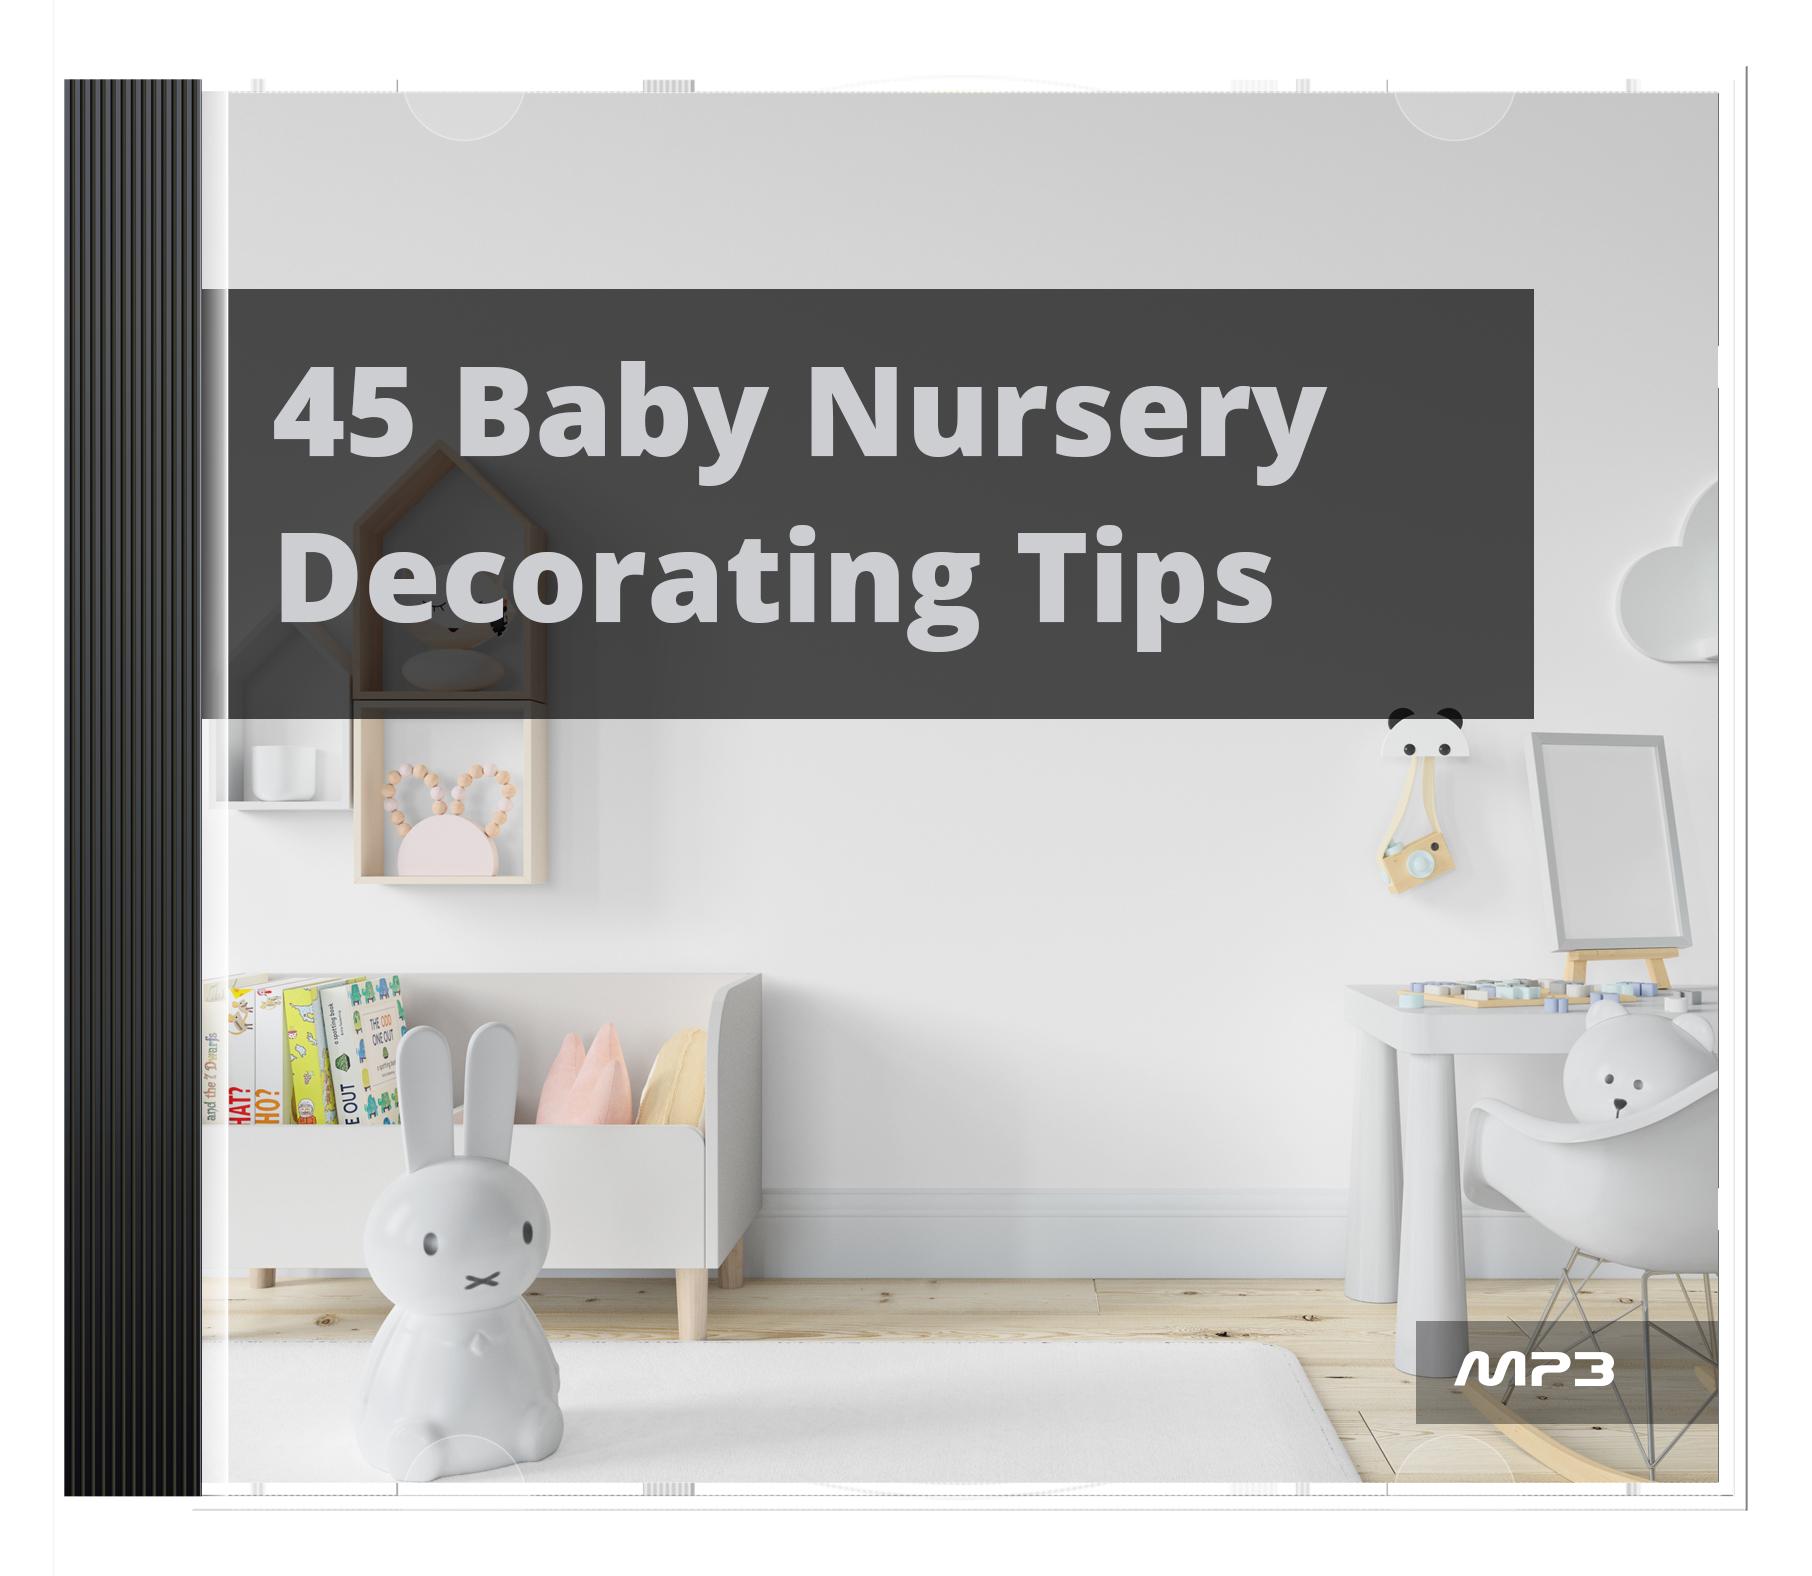 45 Baby Nursery Decorating Tips's Ebook Image